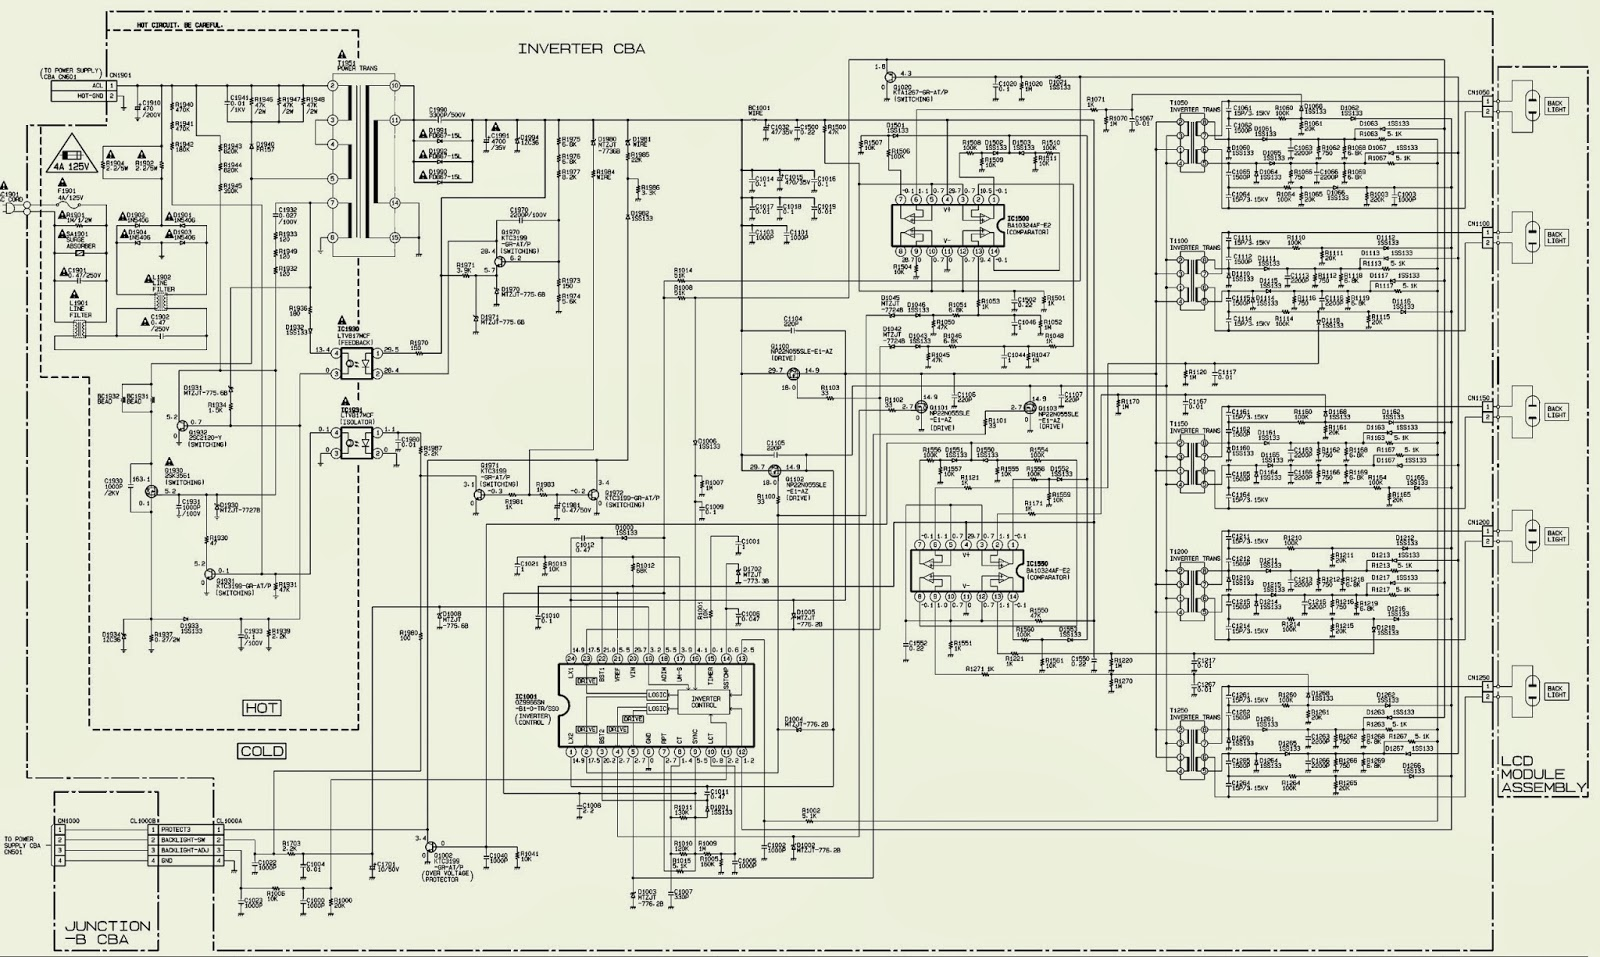 Wiring Diagram Inverter Toshiba : Toshiba inverter connection diagram free engine